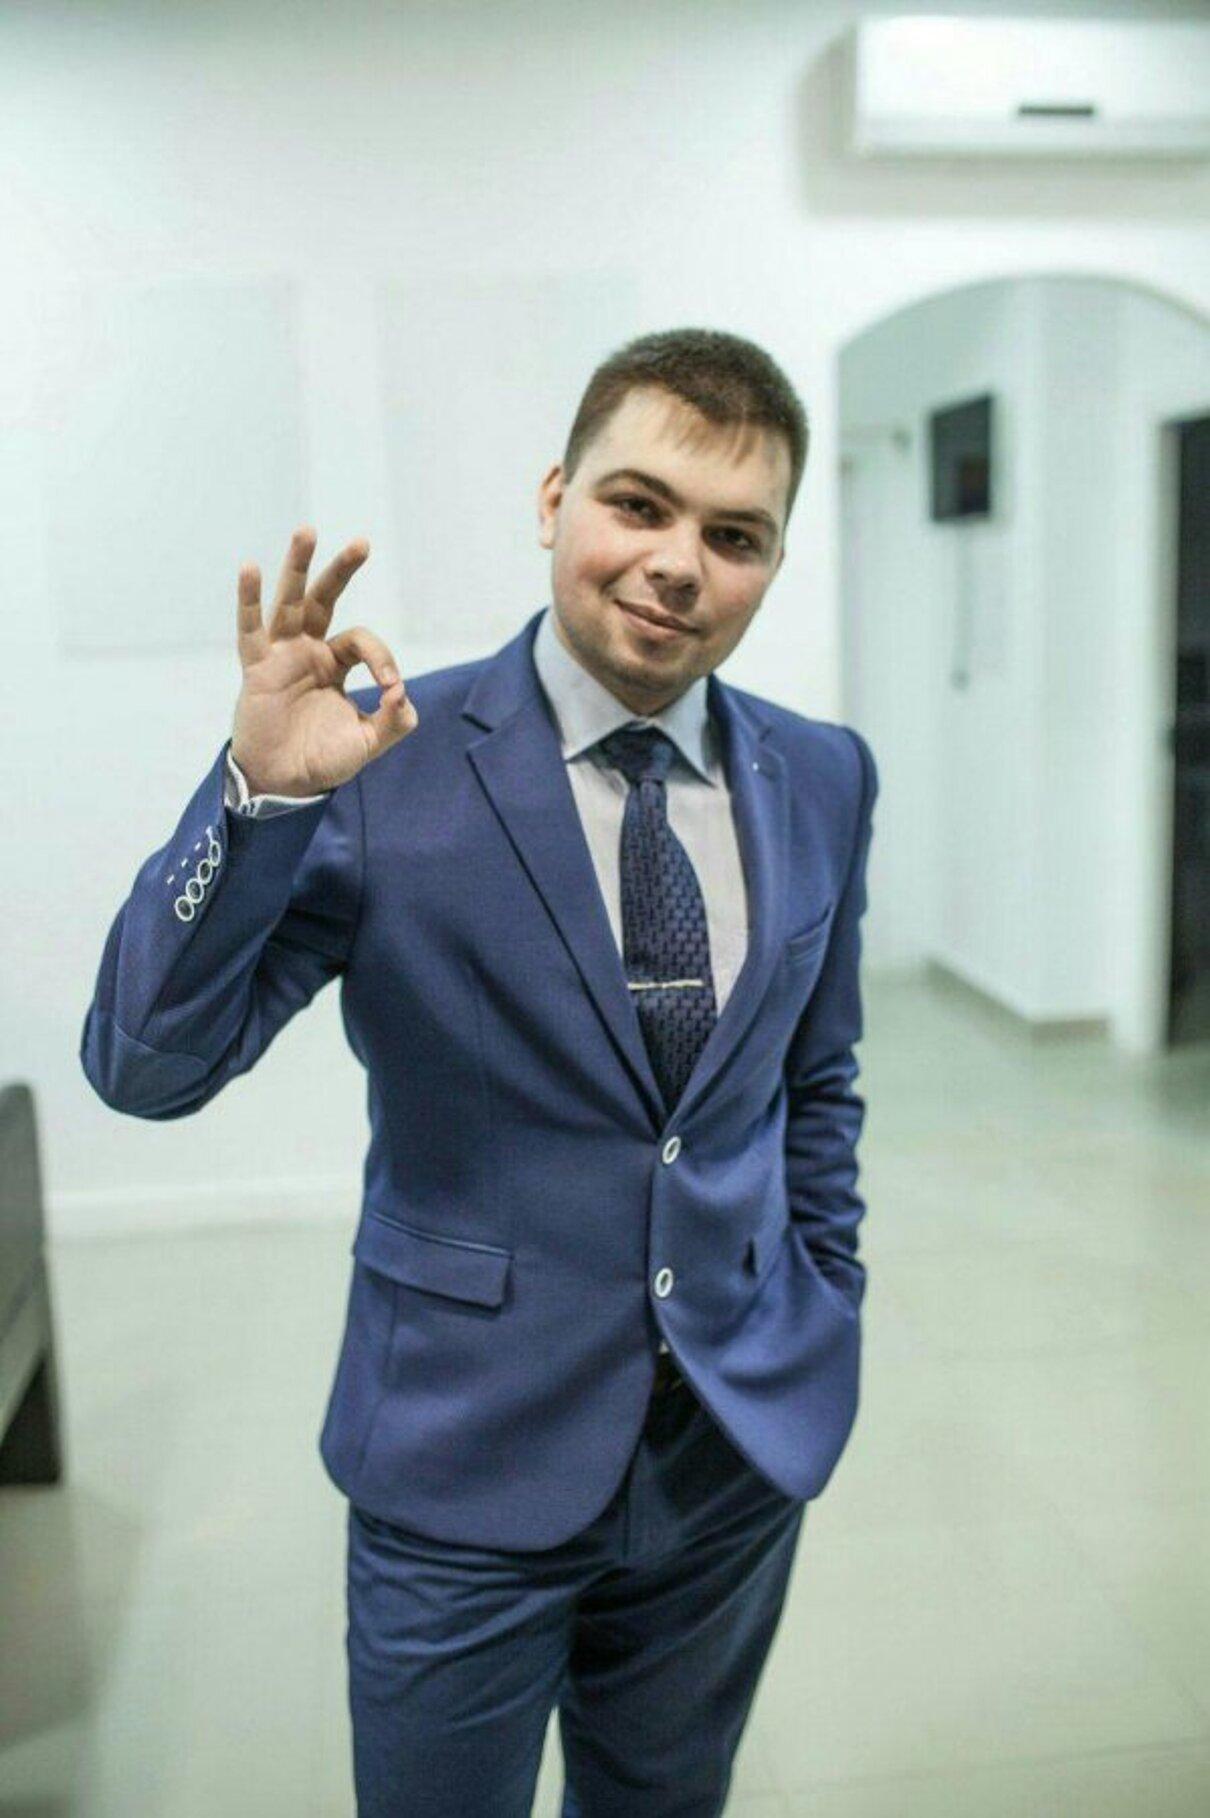 Жалоба-отзыв: Andrey Rasstrigin - Мошенник.  Фото №3